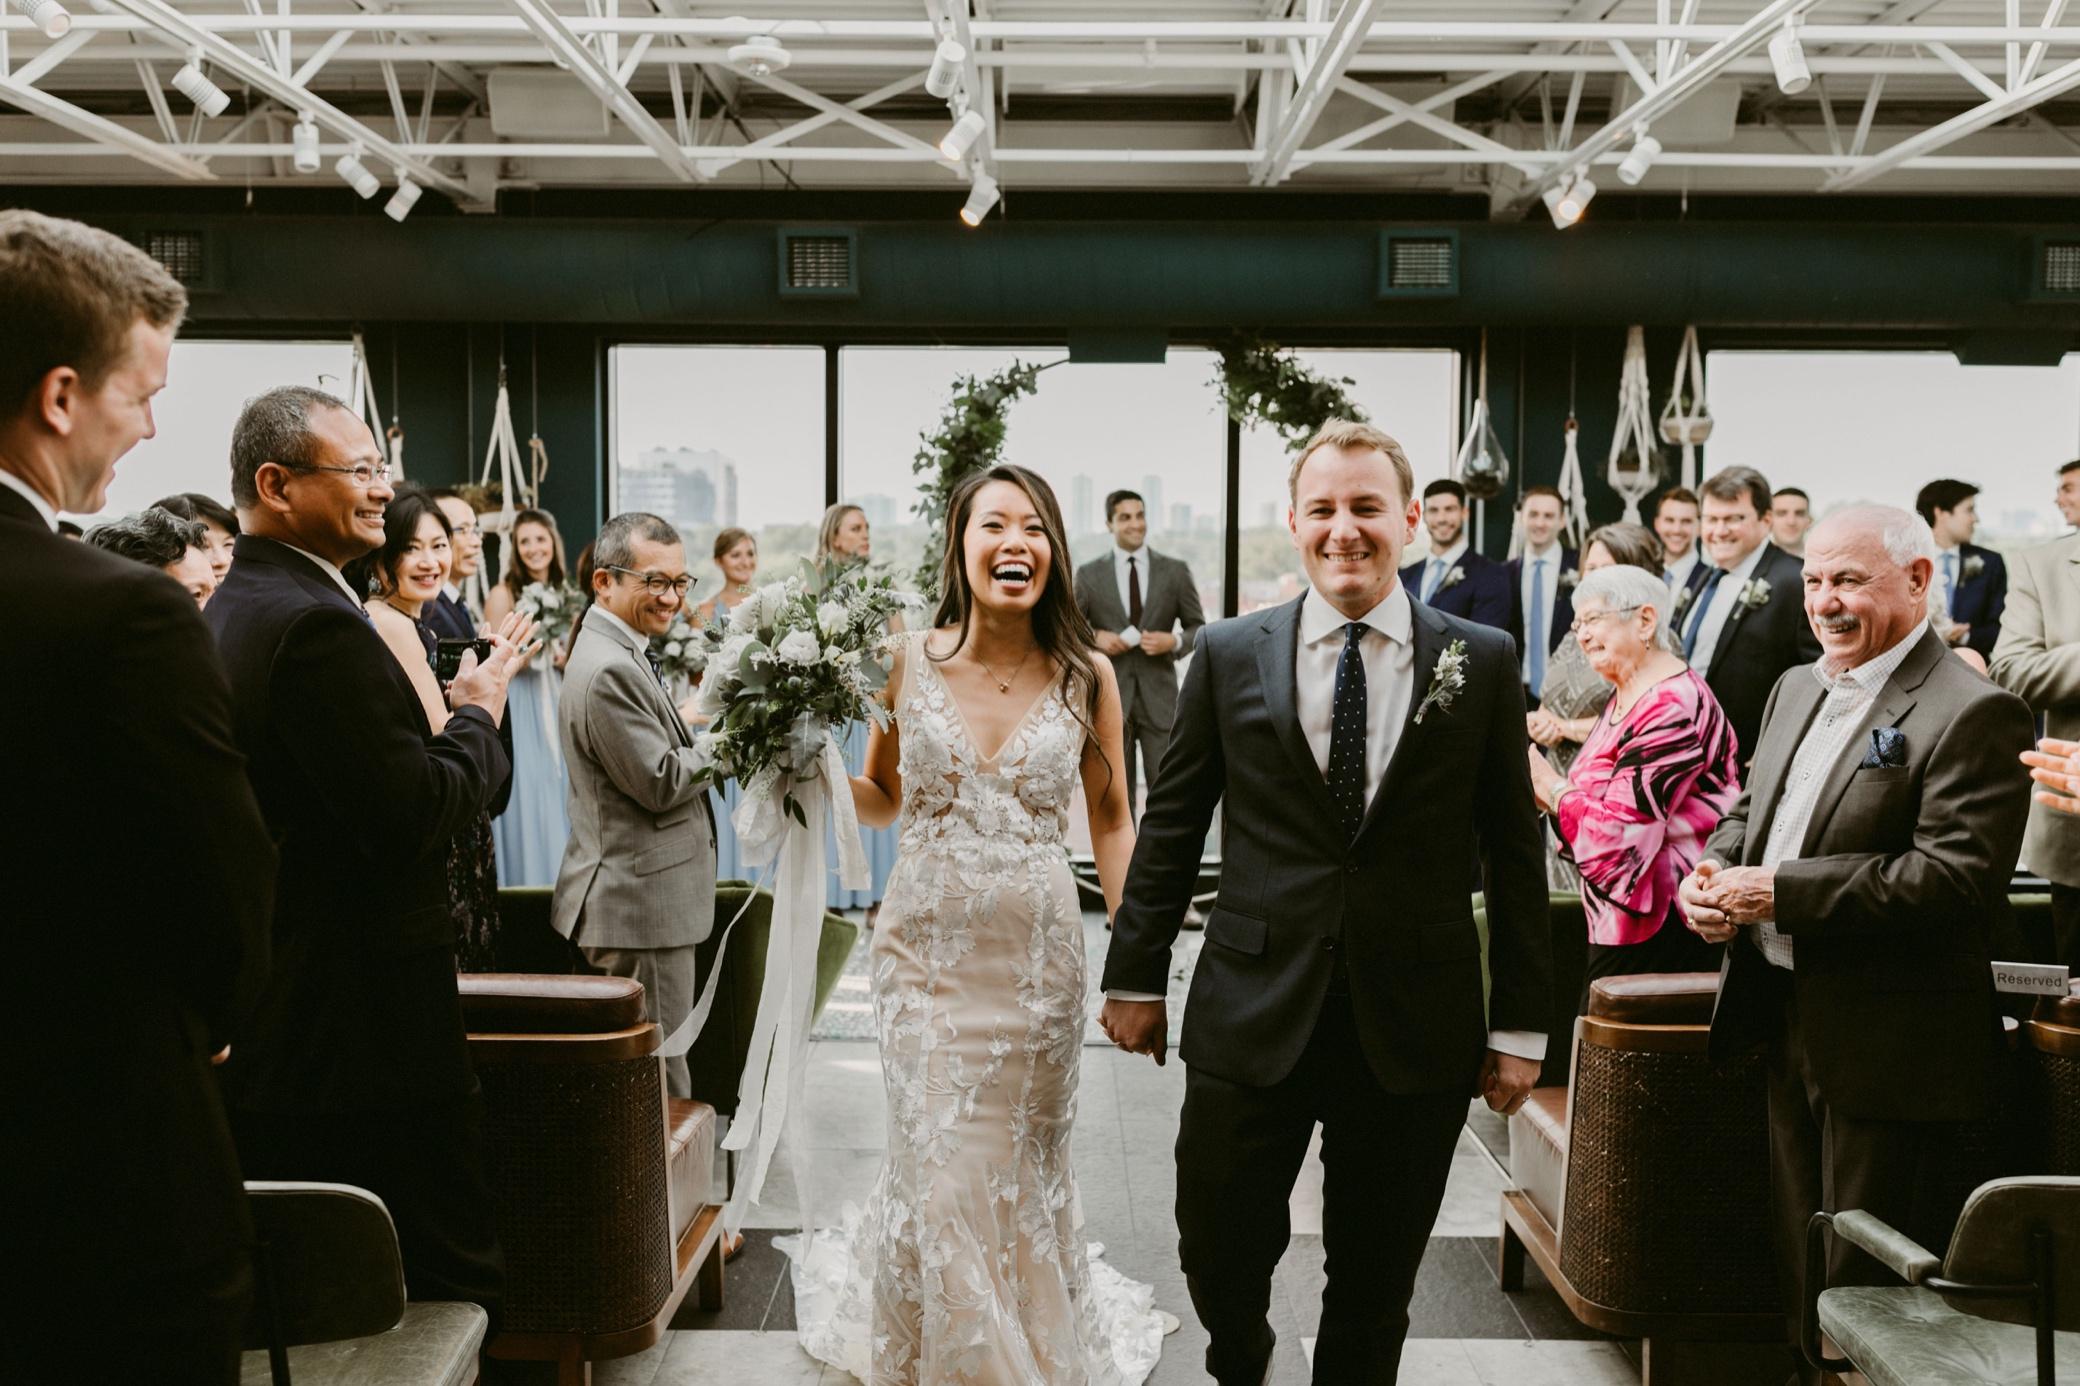 068_The Broadview Hotel Wedding (464 of 913)_Broadview_Hotel_City_Toronto_Wedding.jpg